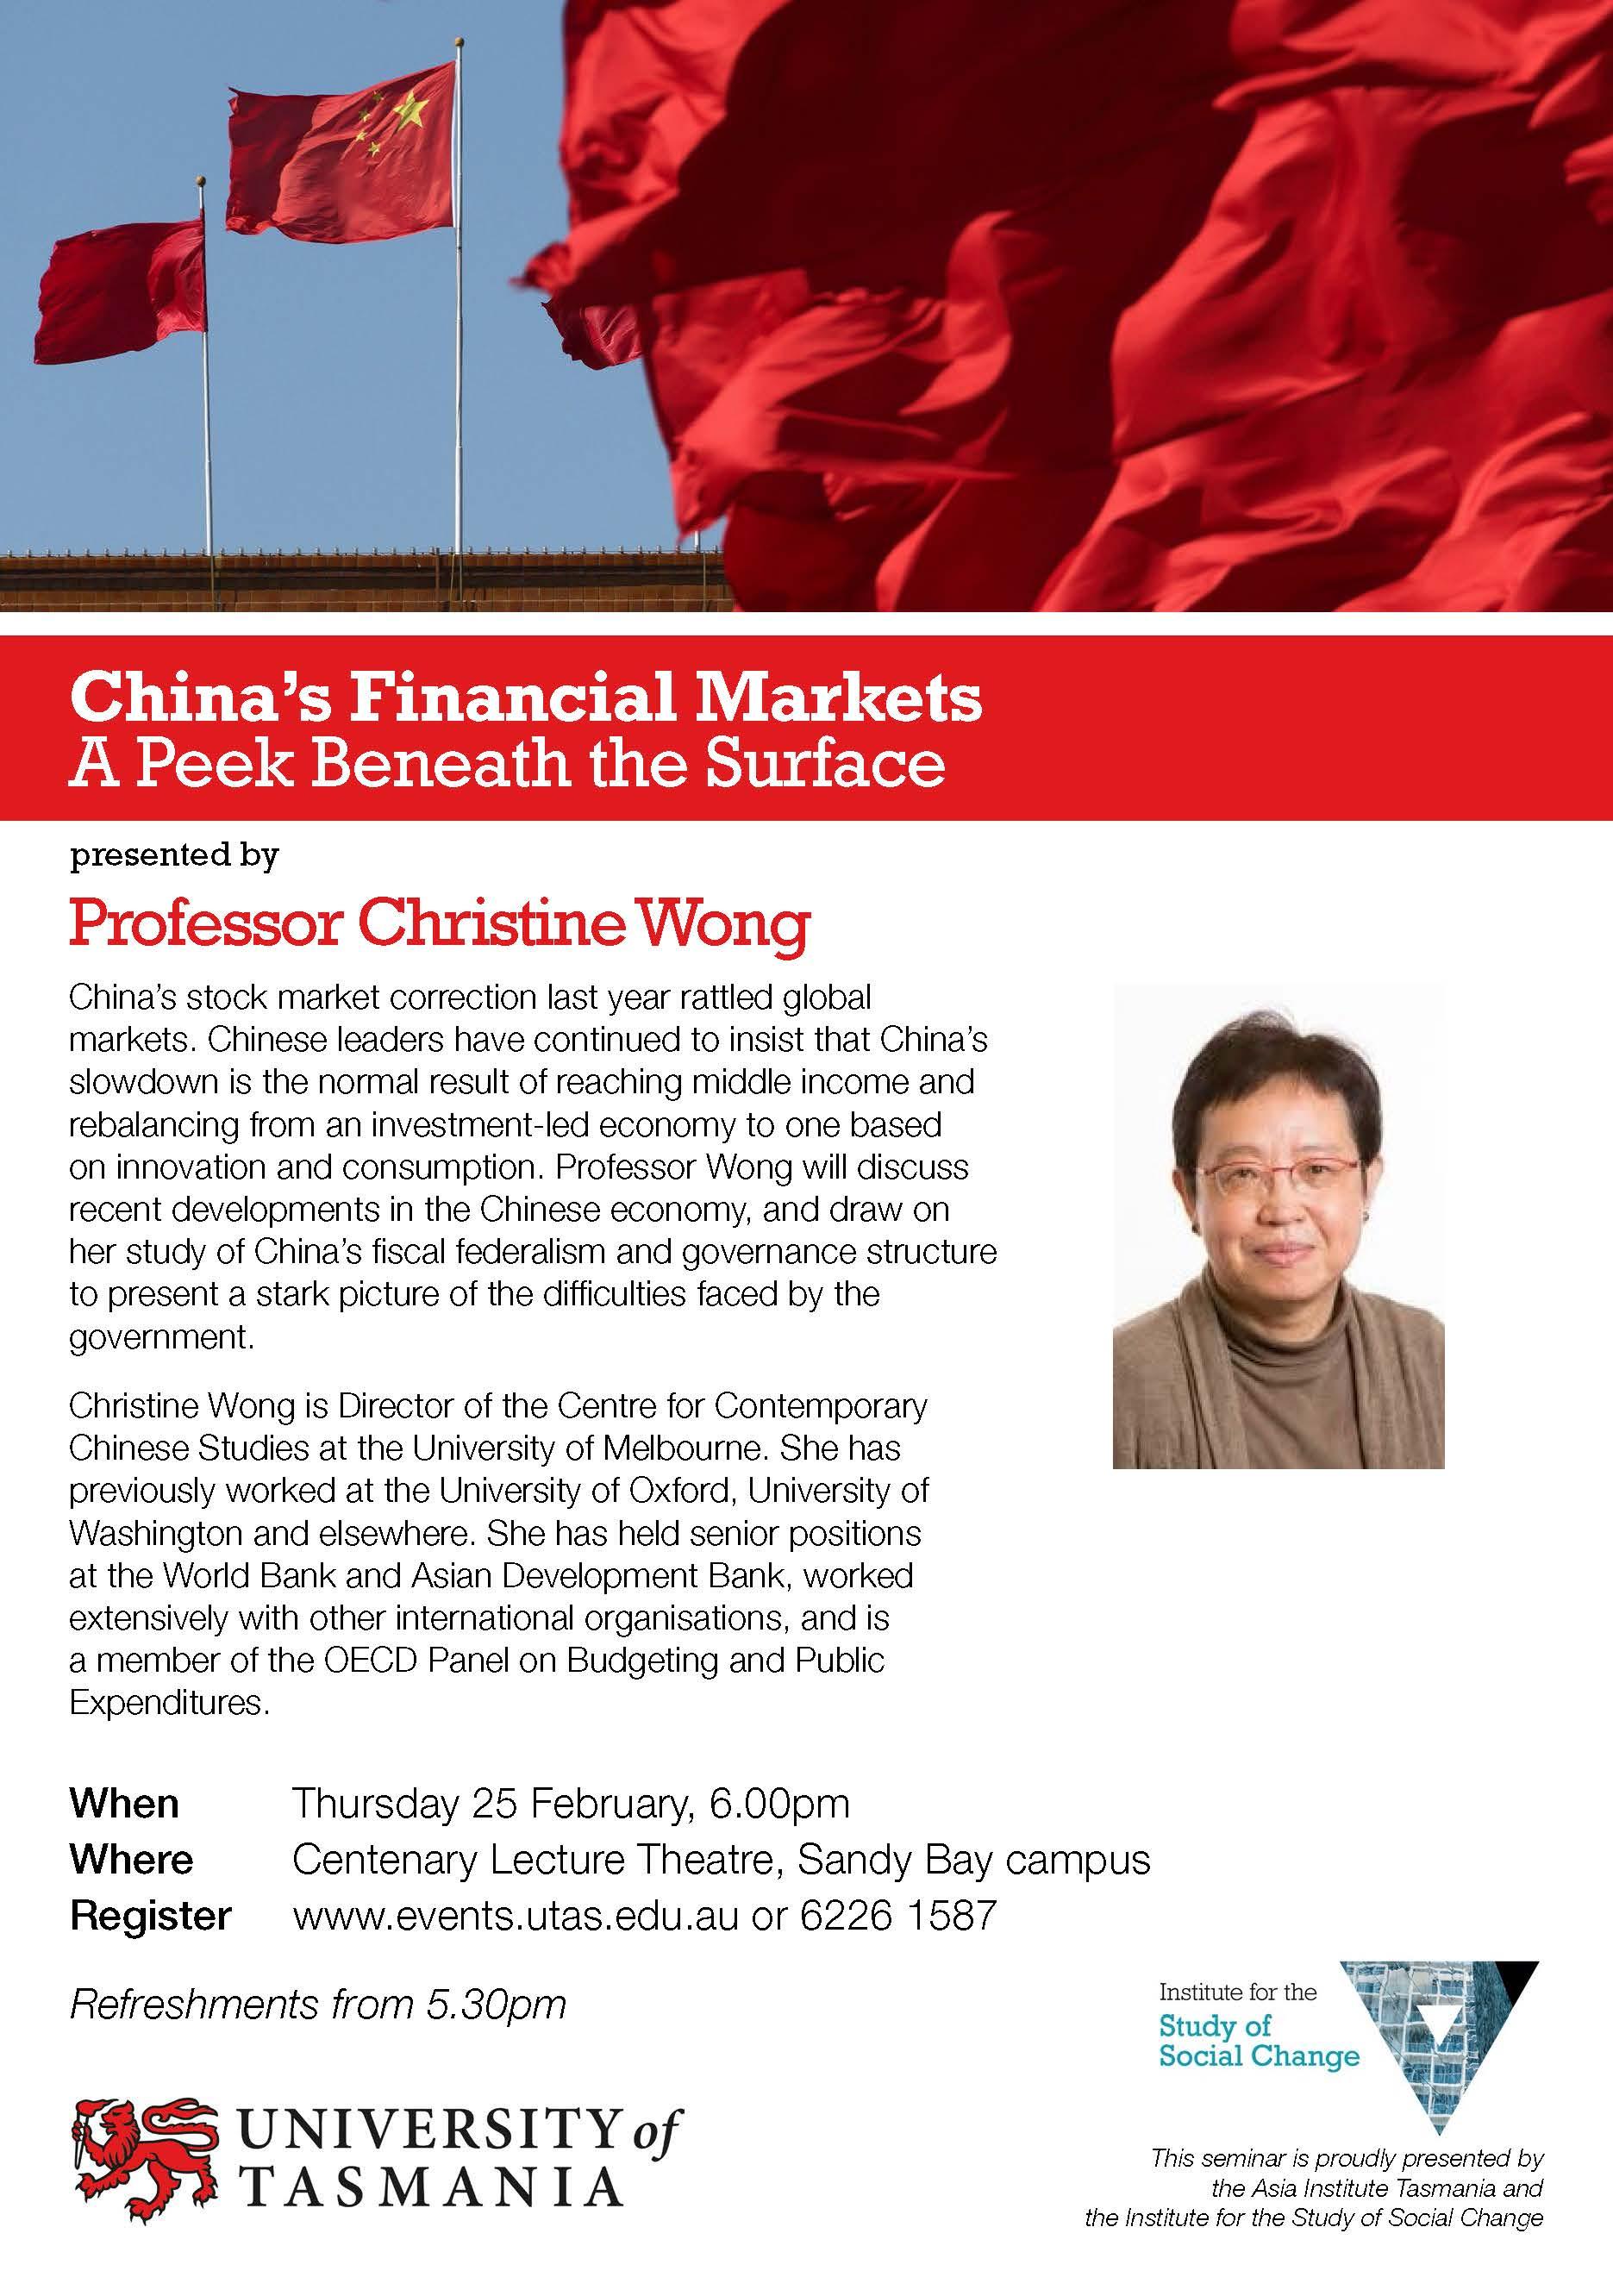 Christine Wong Public Lecture Flyer